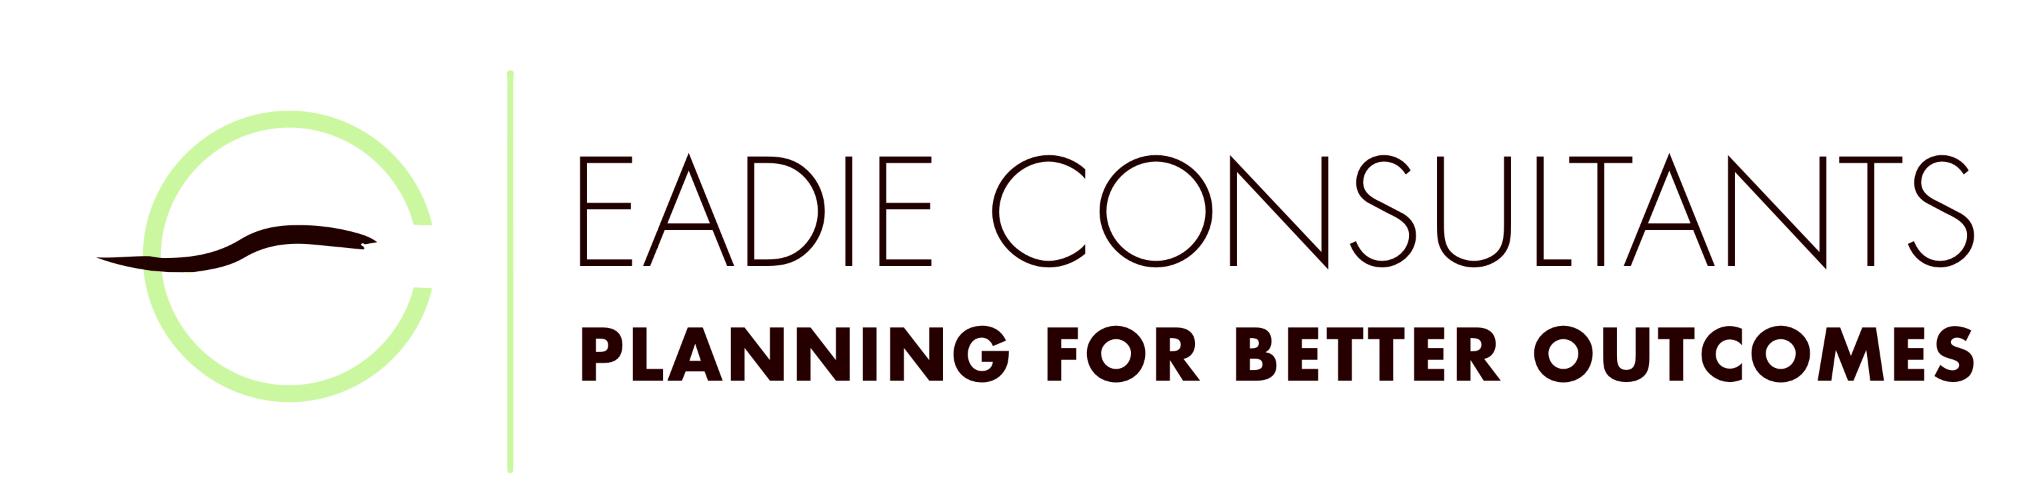 Eadie Consultants